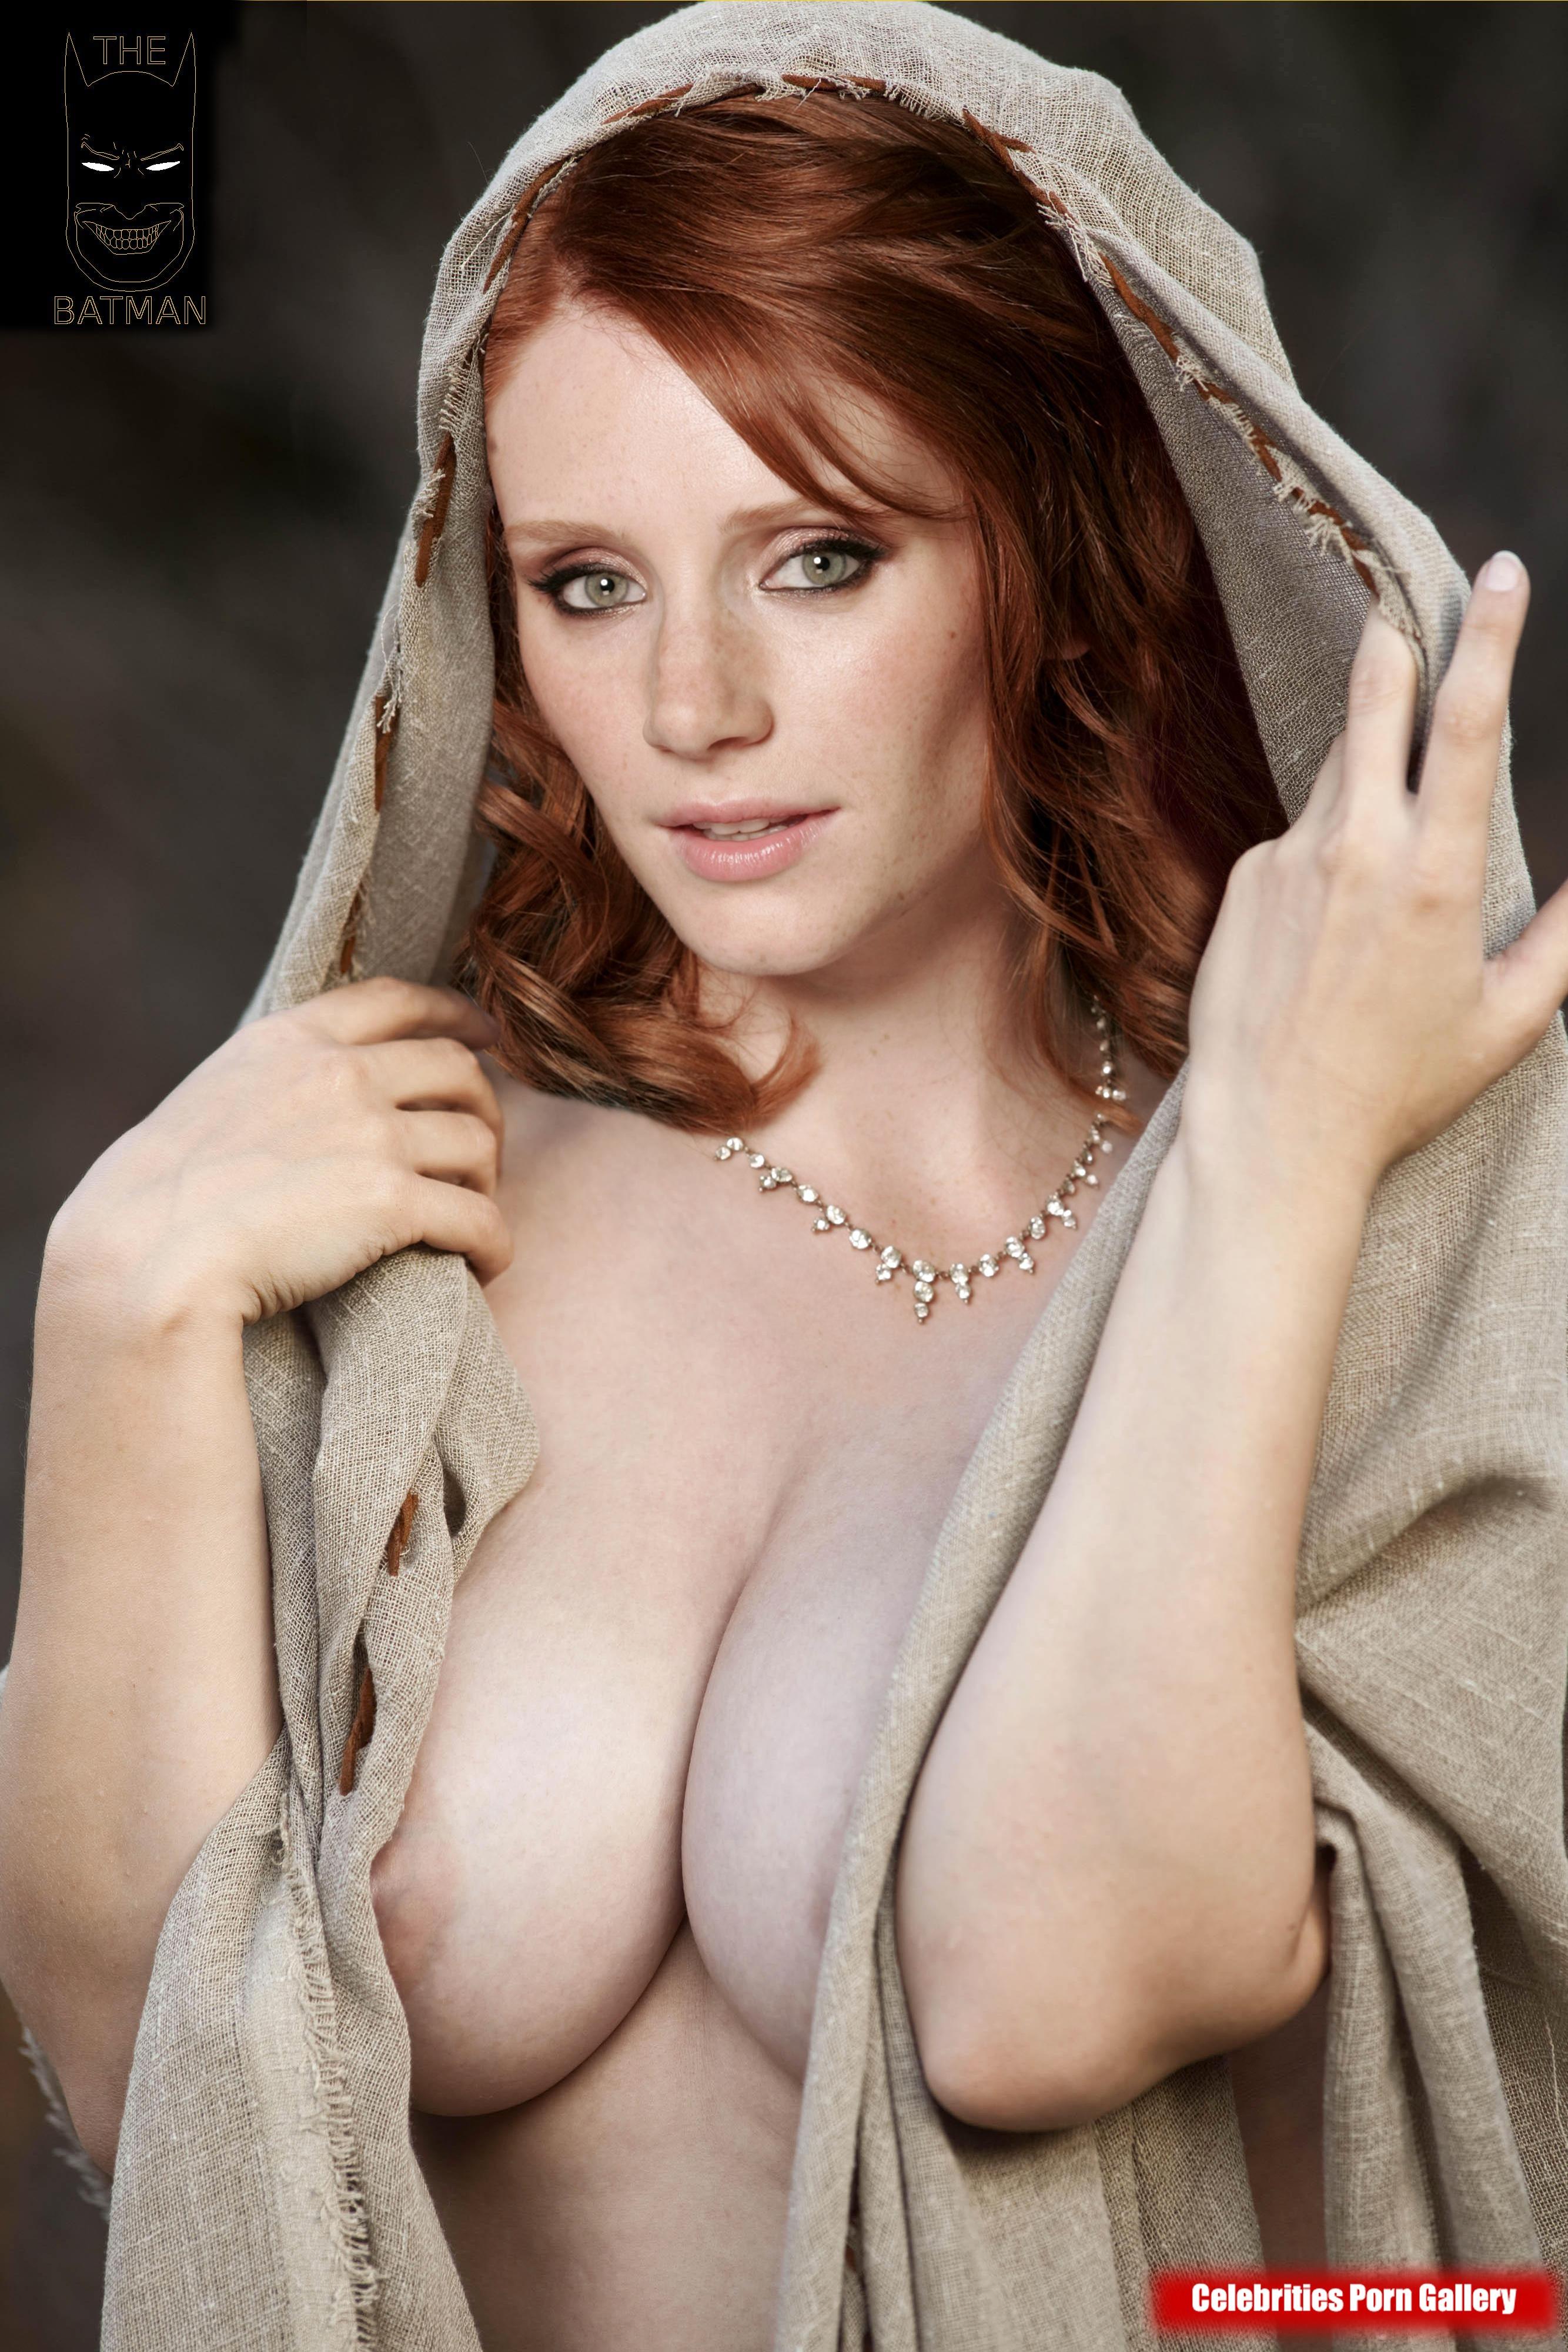 Bryce dallas howard leaked nudes